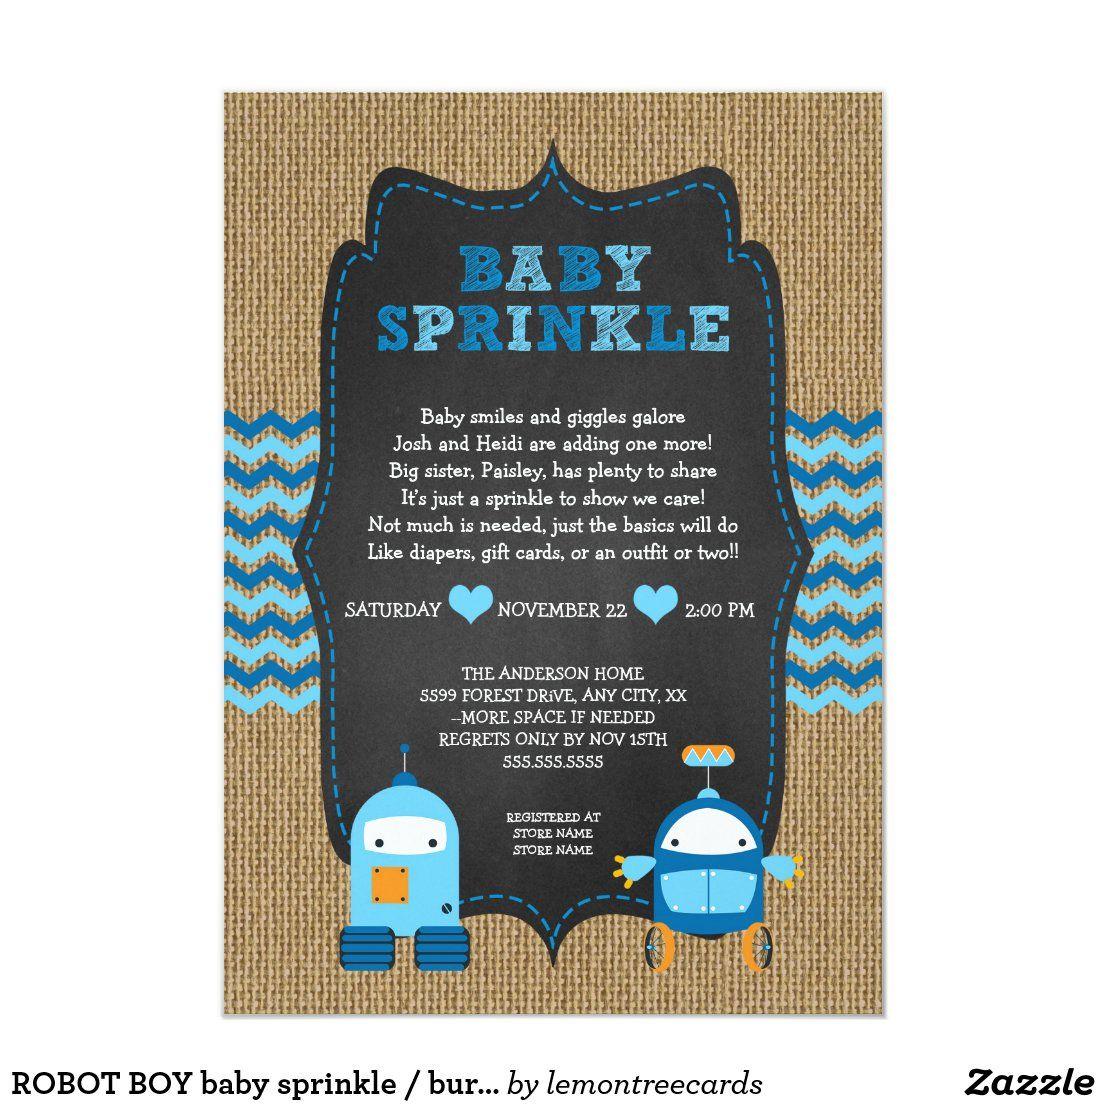 ROBOT BOY baby sprinkle / burlap chalkboard RUSTIC